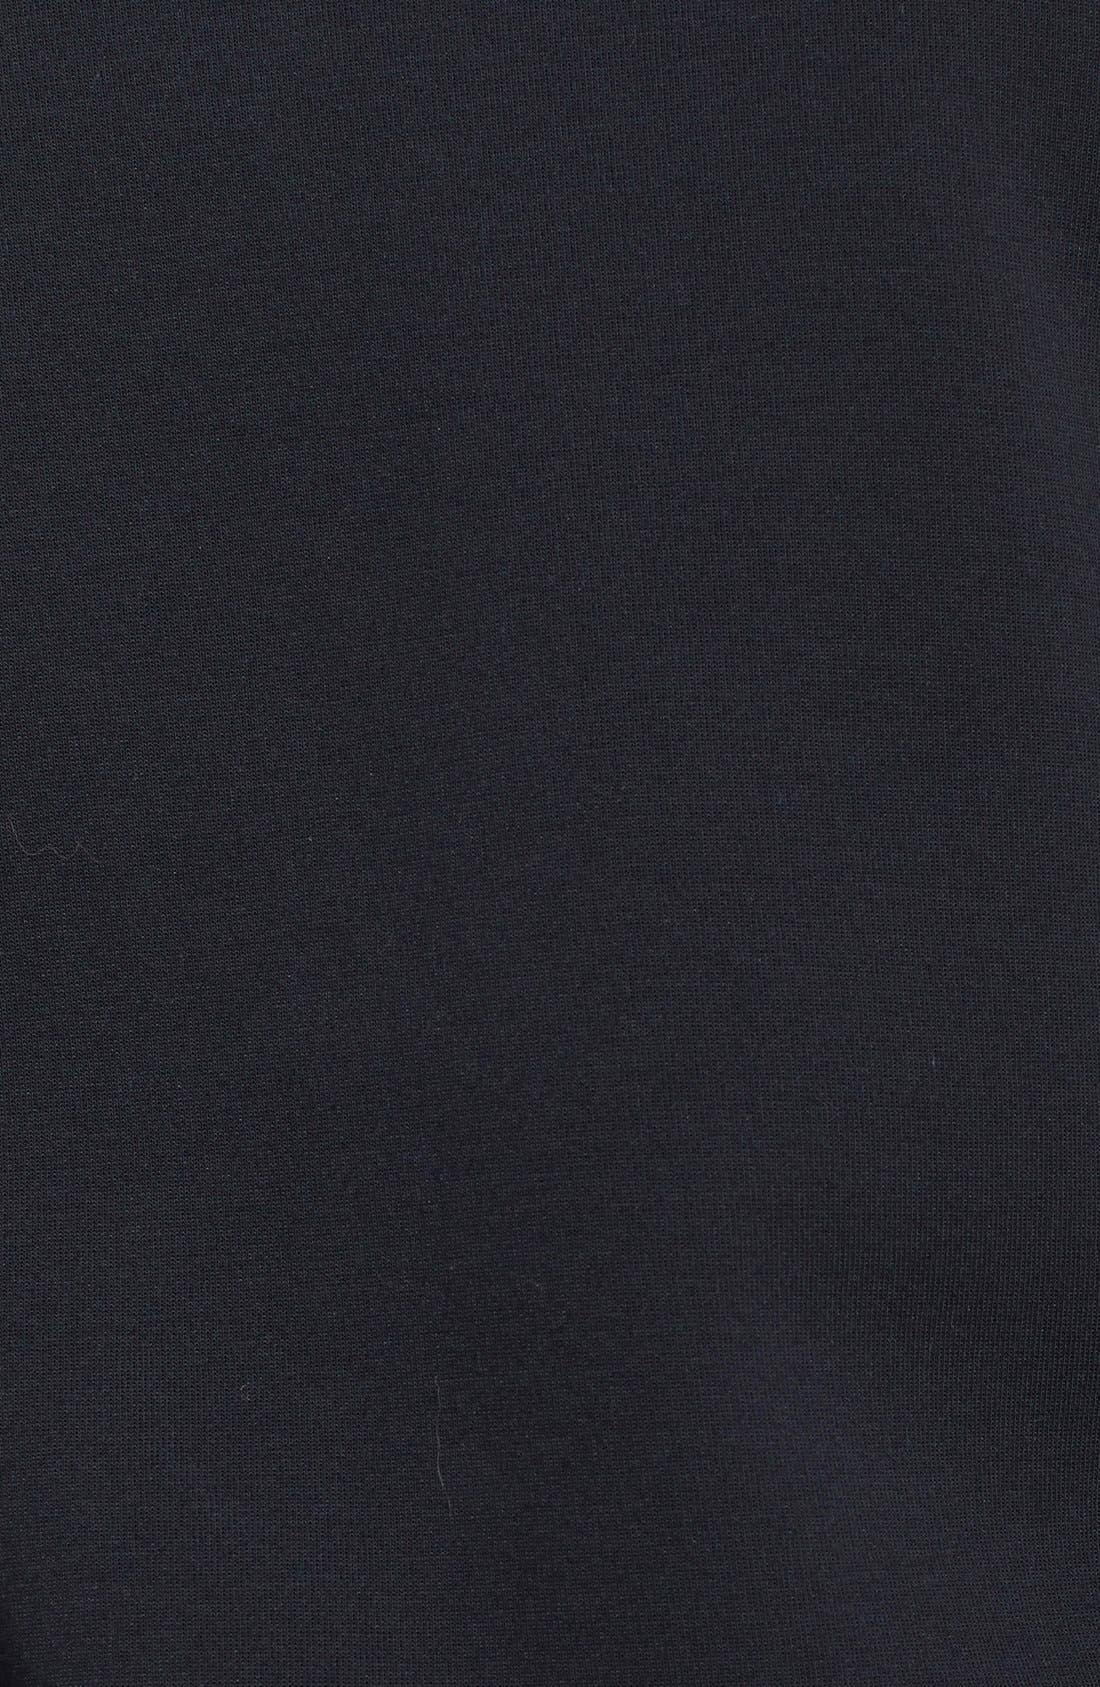 Tech Fleece Jacket,                             Alternate thumbnail 2, color,                             010